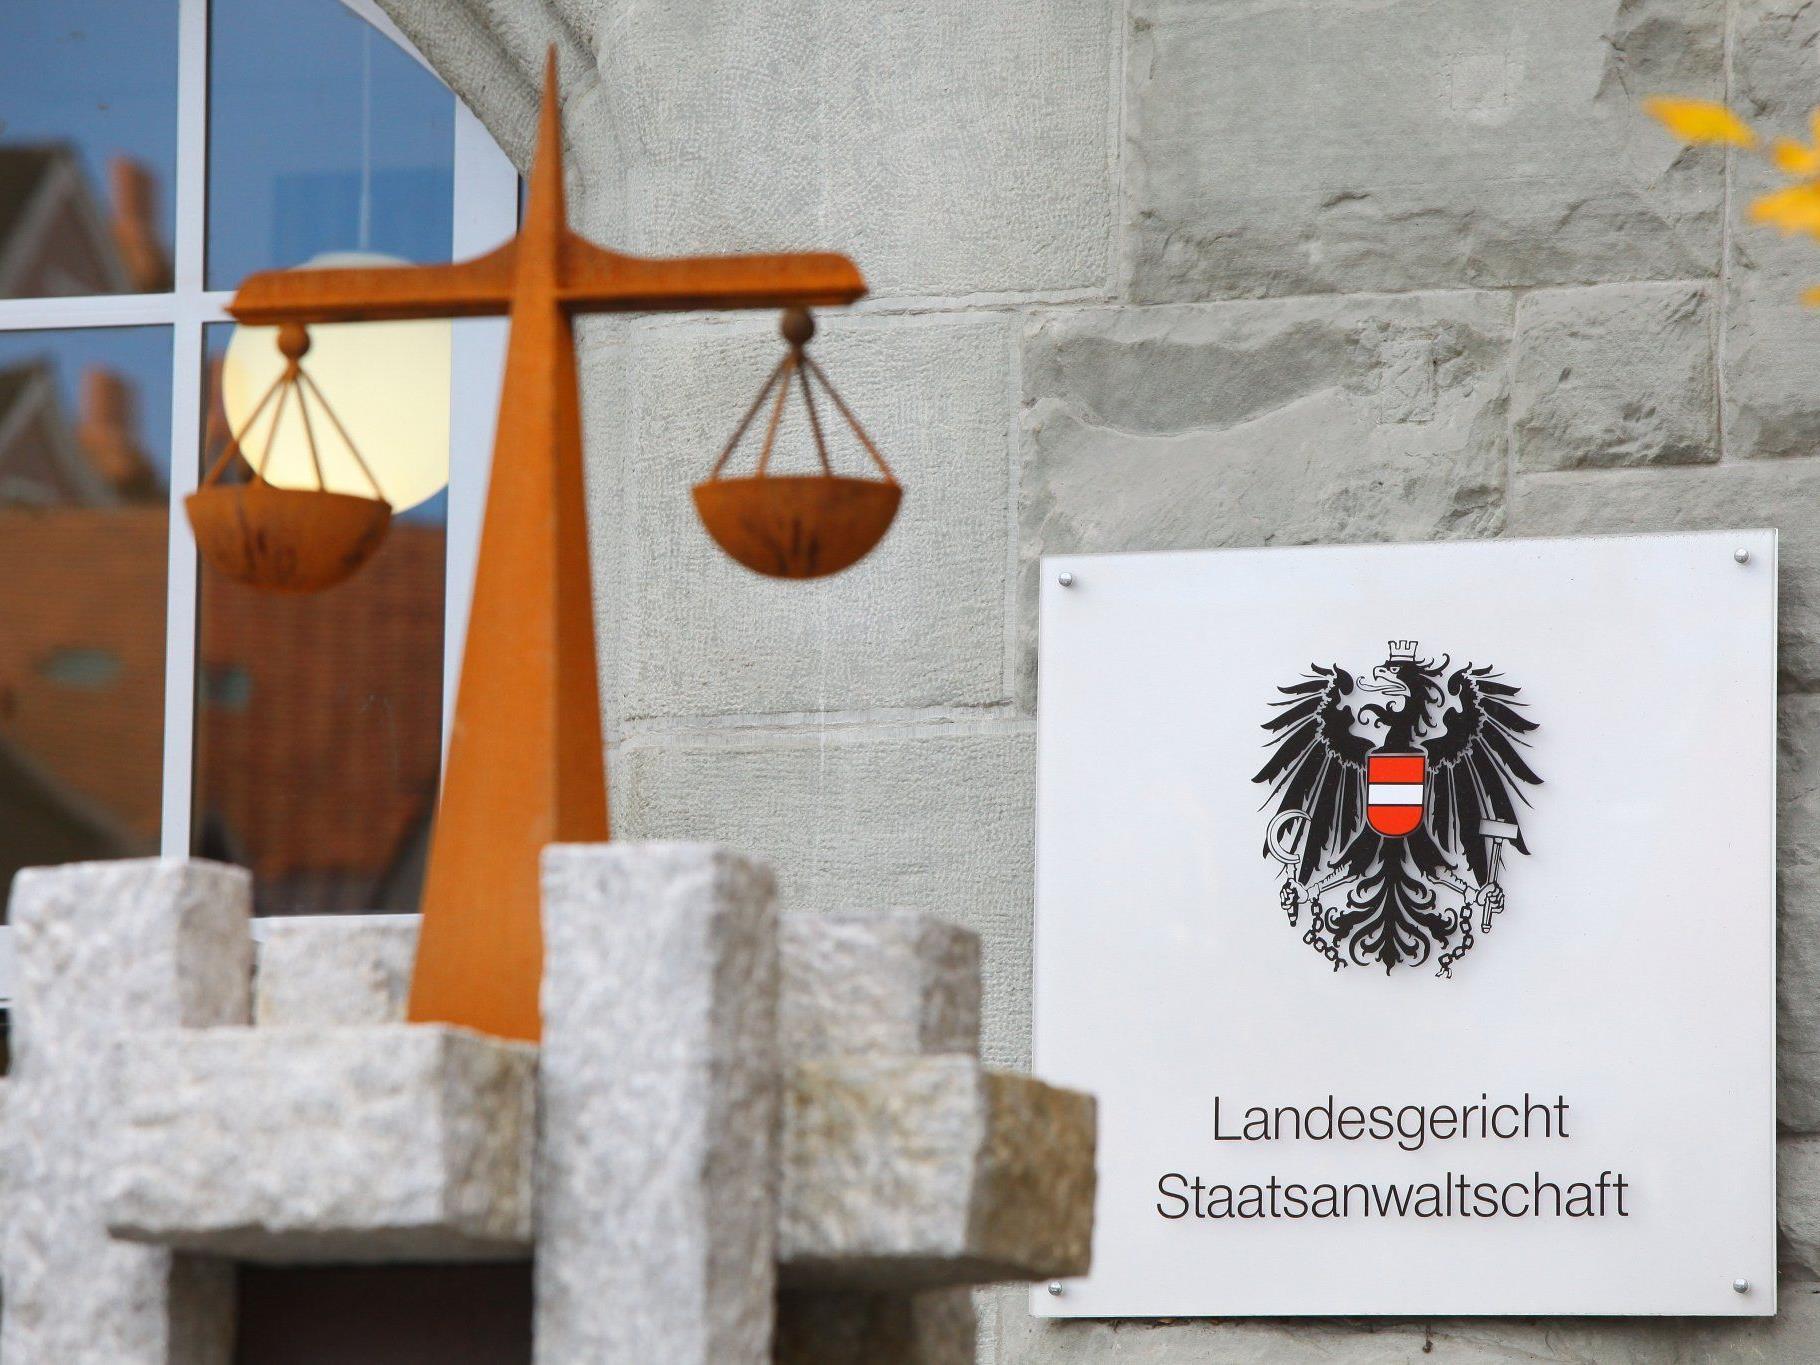 Der 46-jährige Alkolenker wurde in Feldkirch freigesprochen.